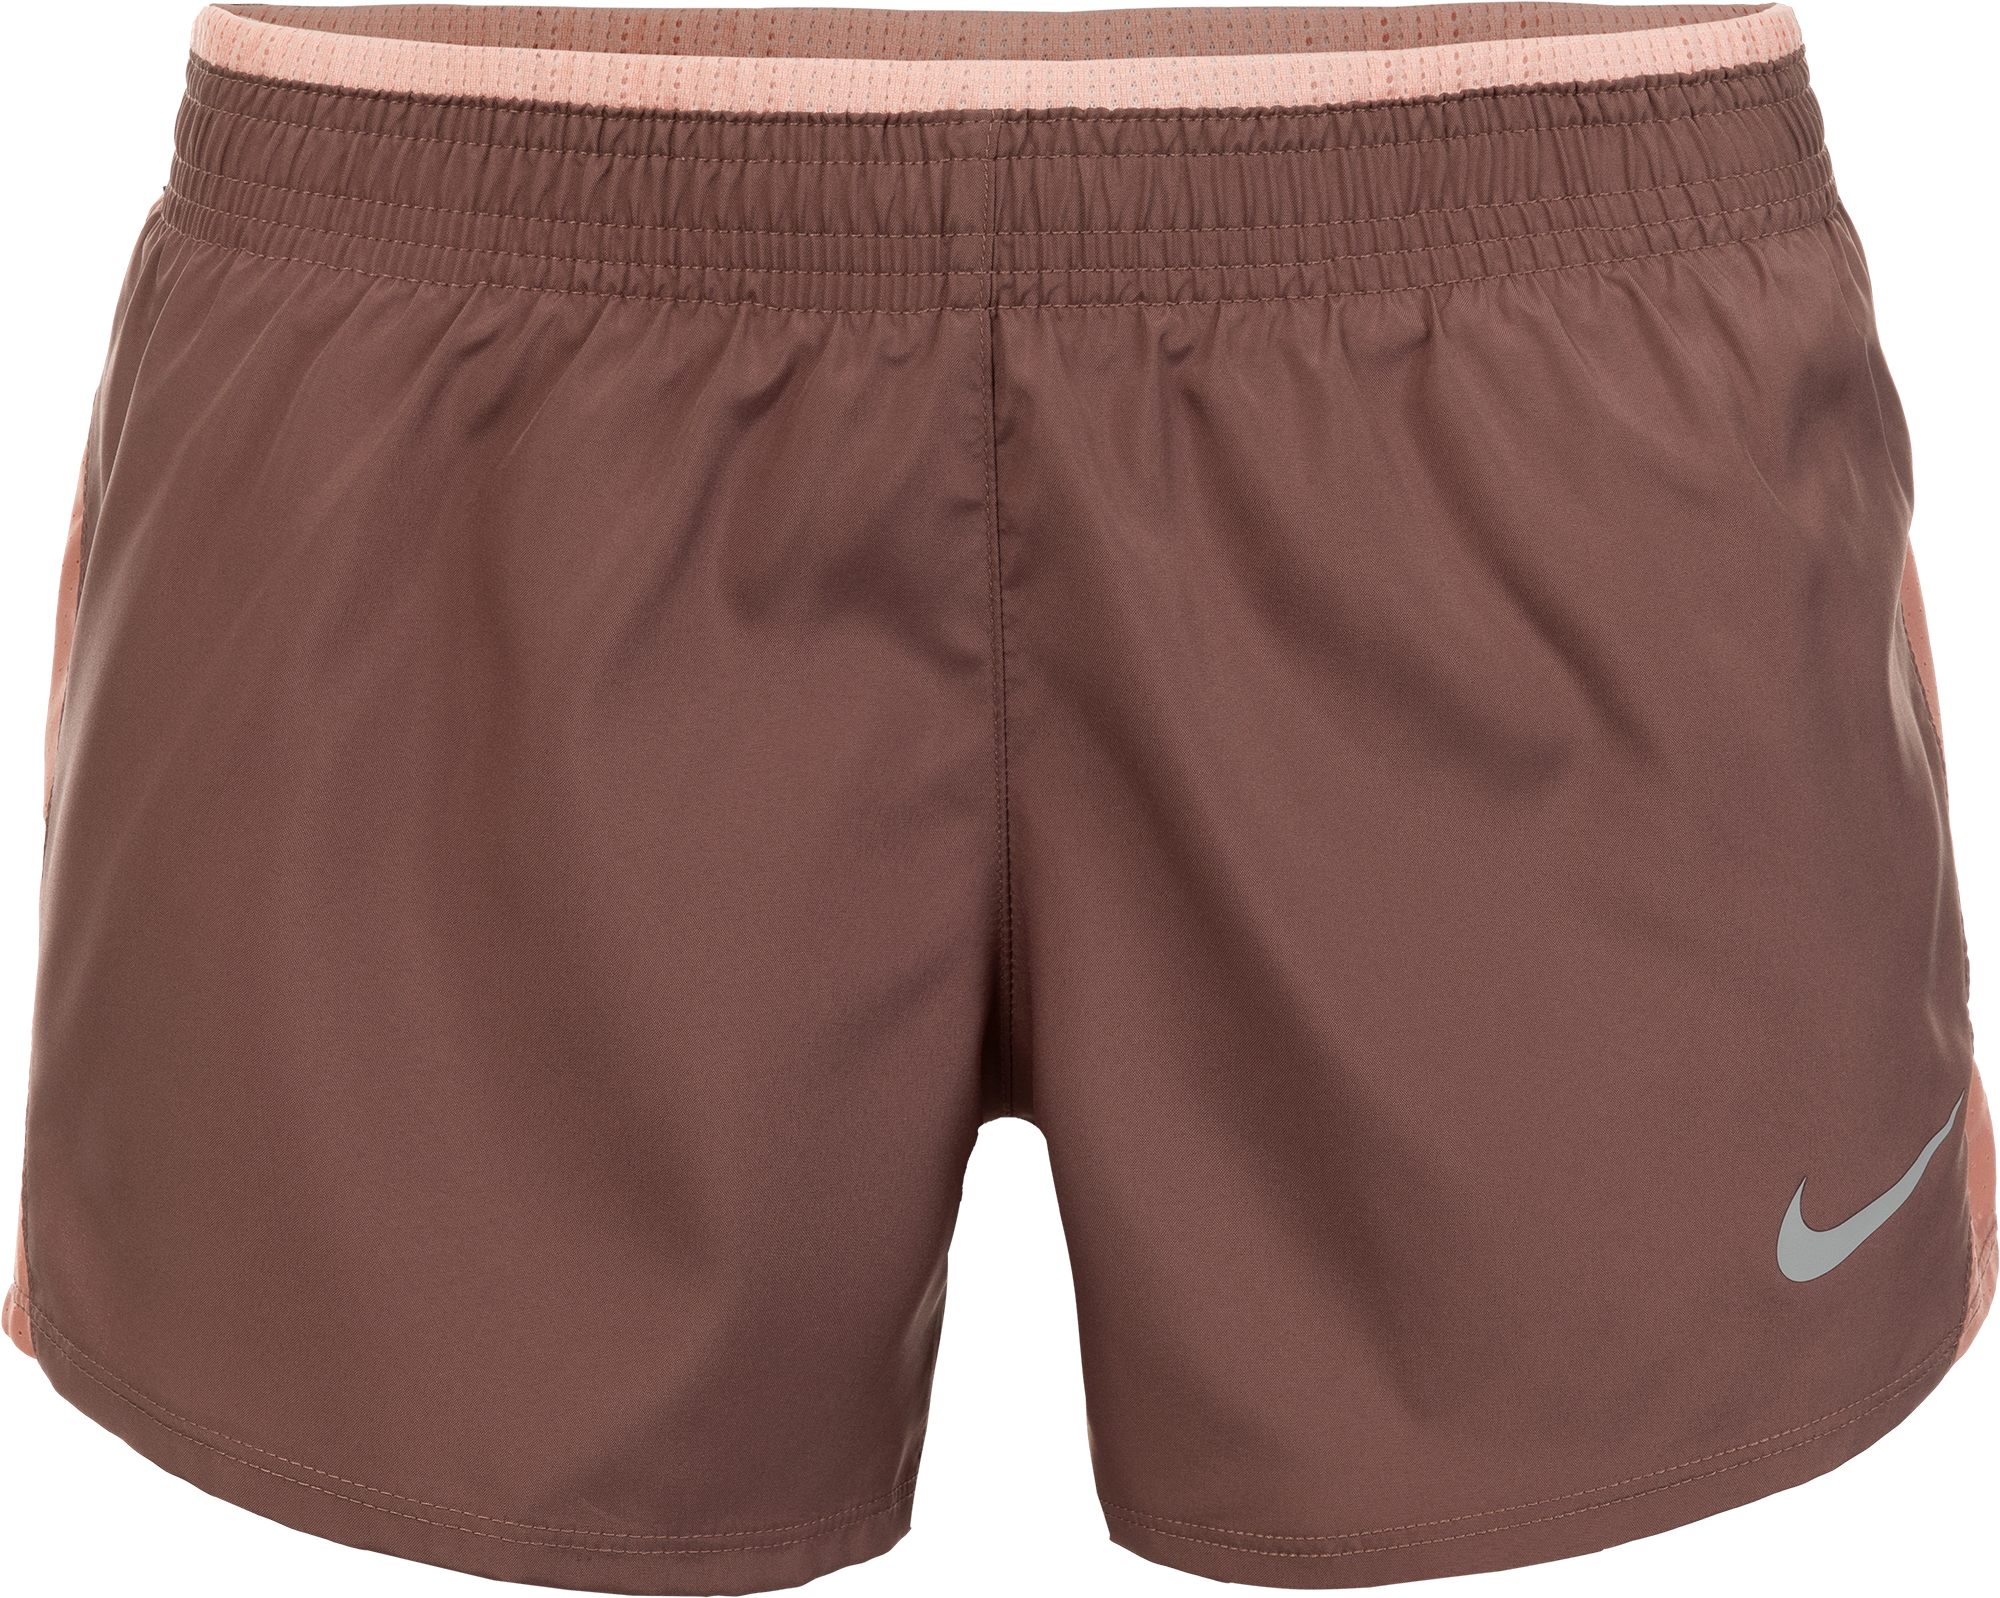 Nike Шорты женские  10K, размер 46-48